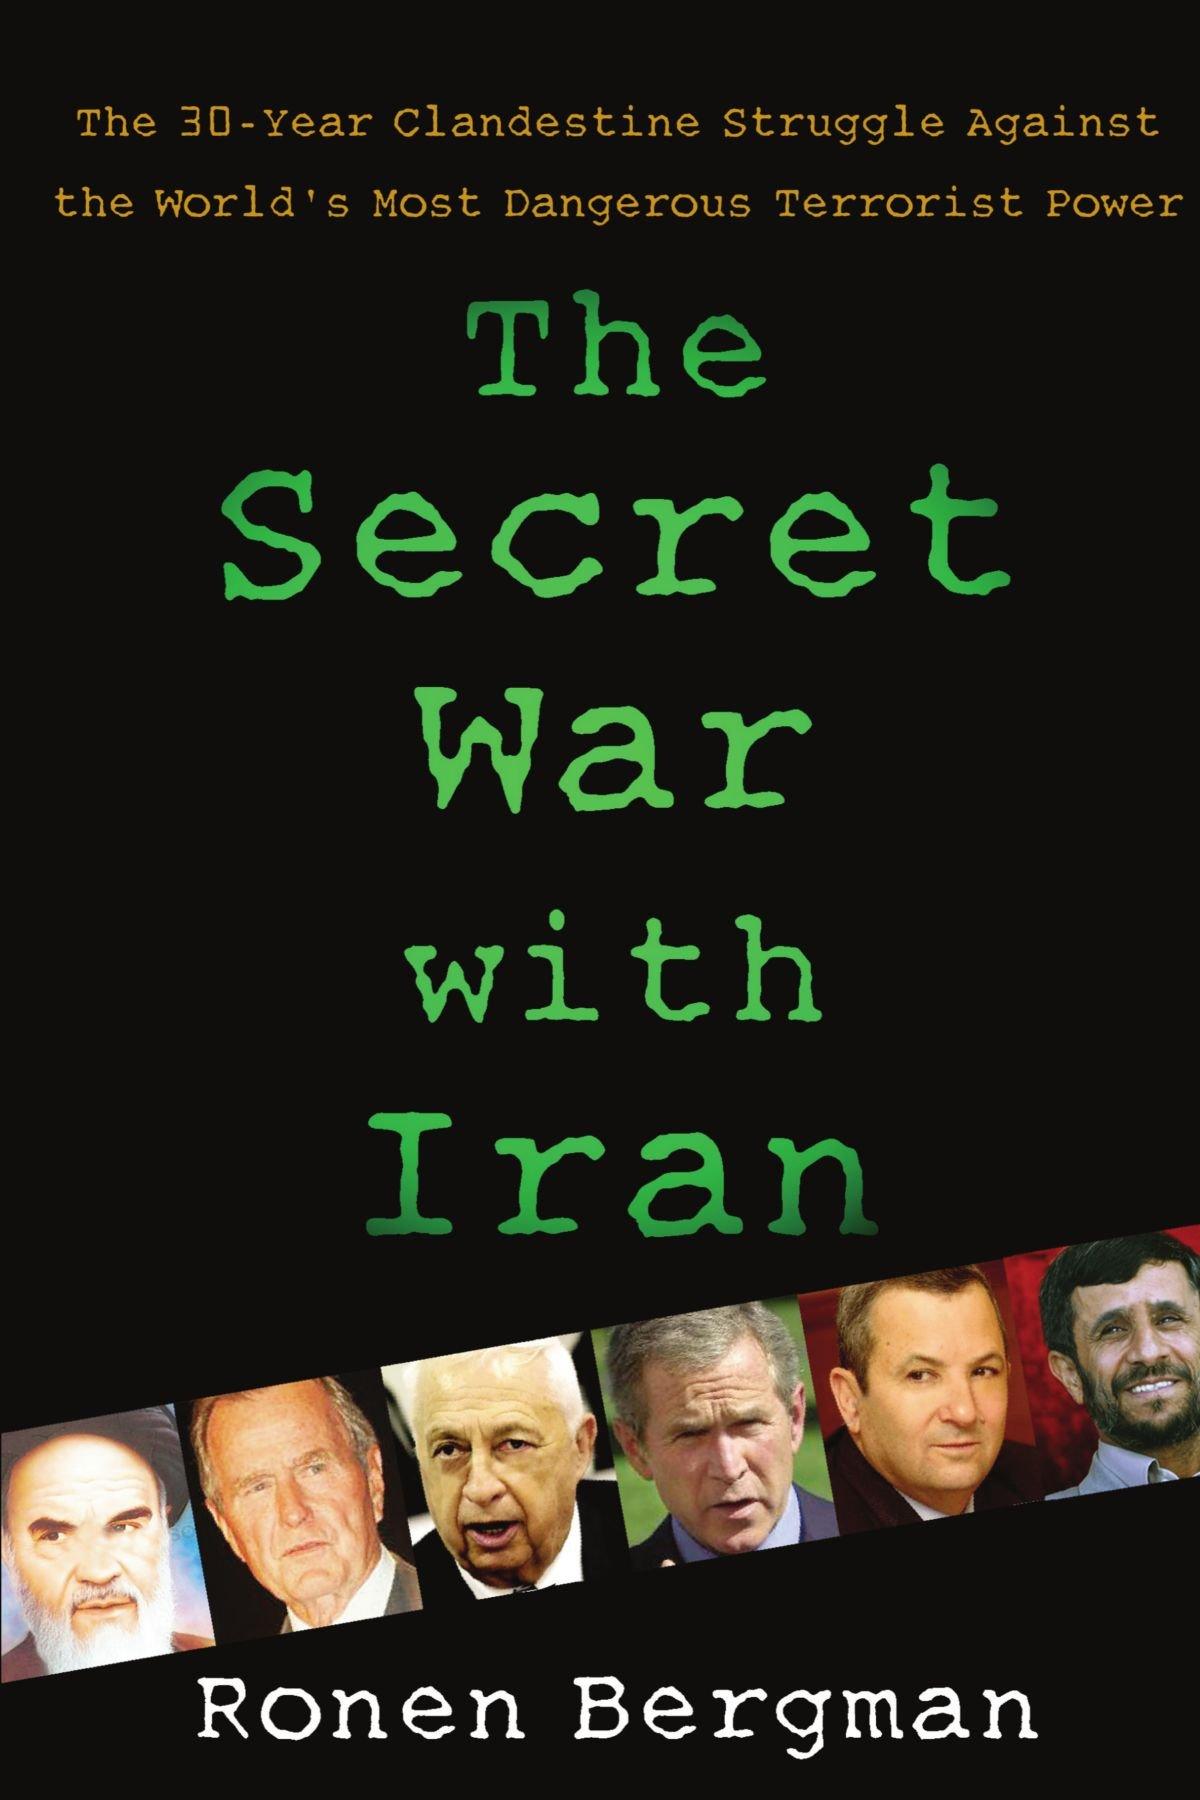 The Secret War with Iran: The 30-Year Clandestine Struggle Against the  World's Most Dangerous Terrorist Power: Ronen Bergman Ph.D.: 9781416577003:  ...